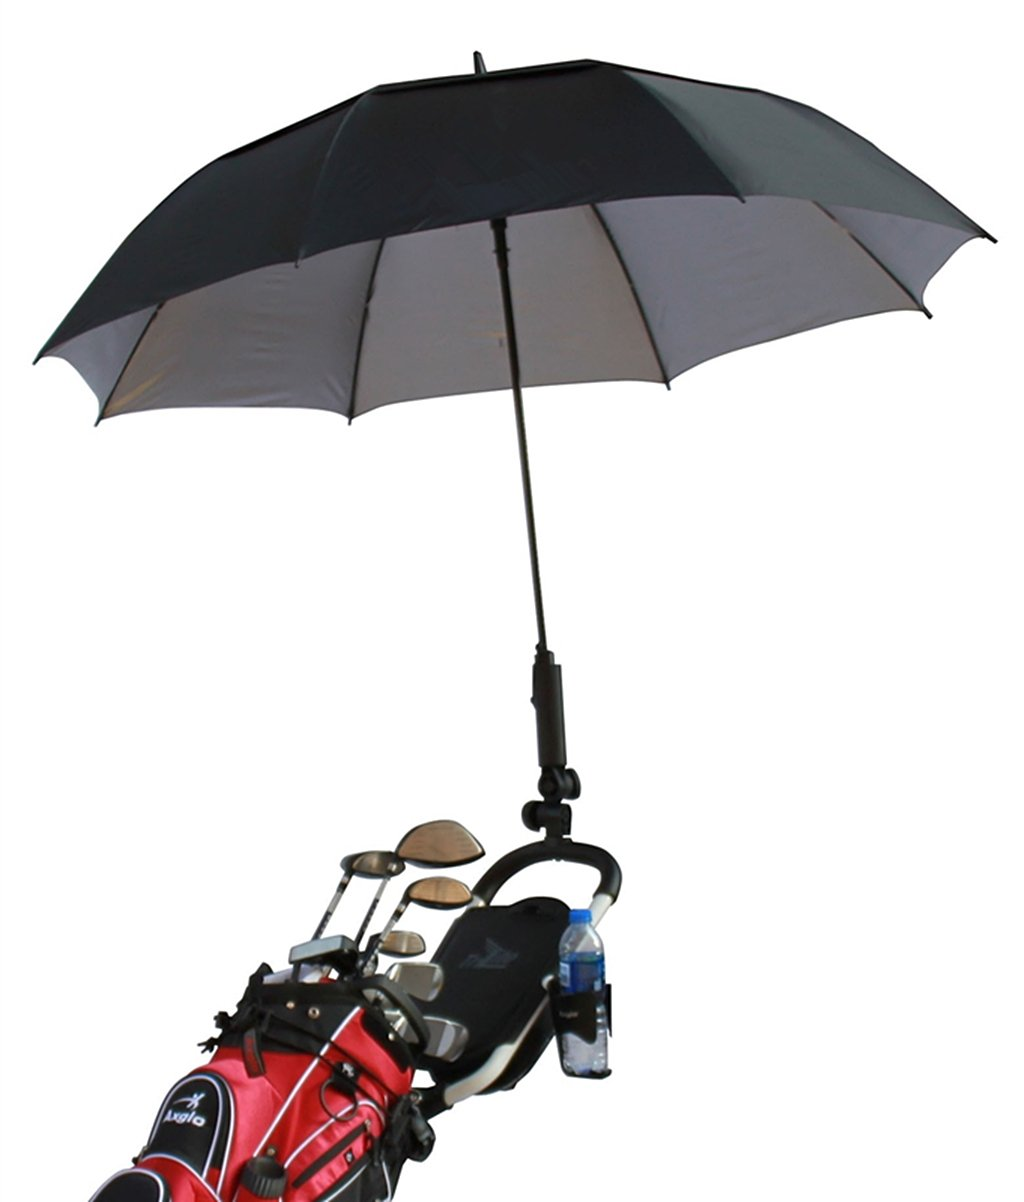 Amazon.com: QIYAT Soporte para paraguas de carrito de golf ...